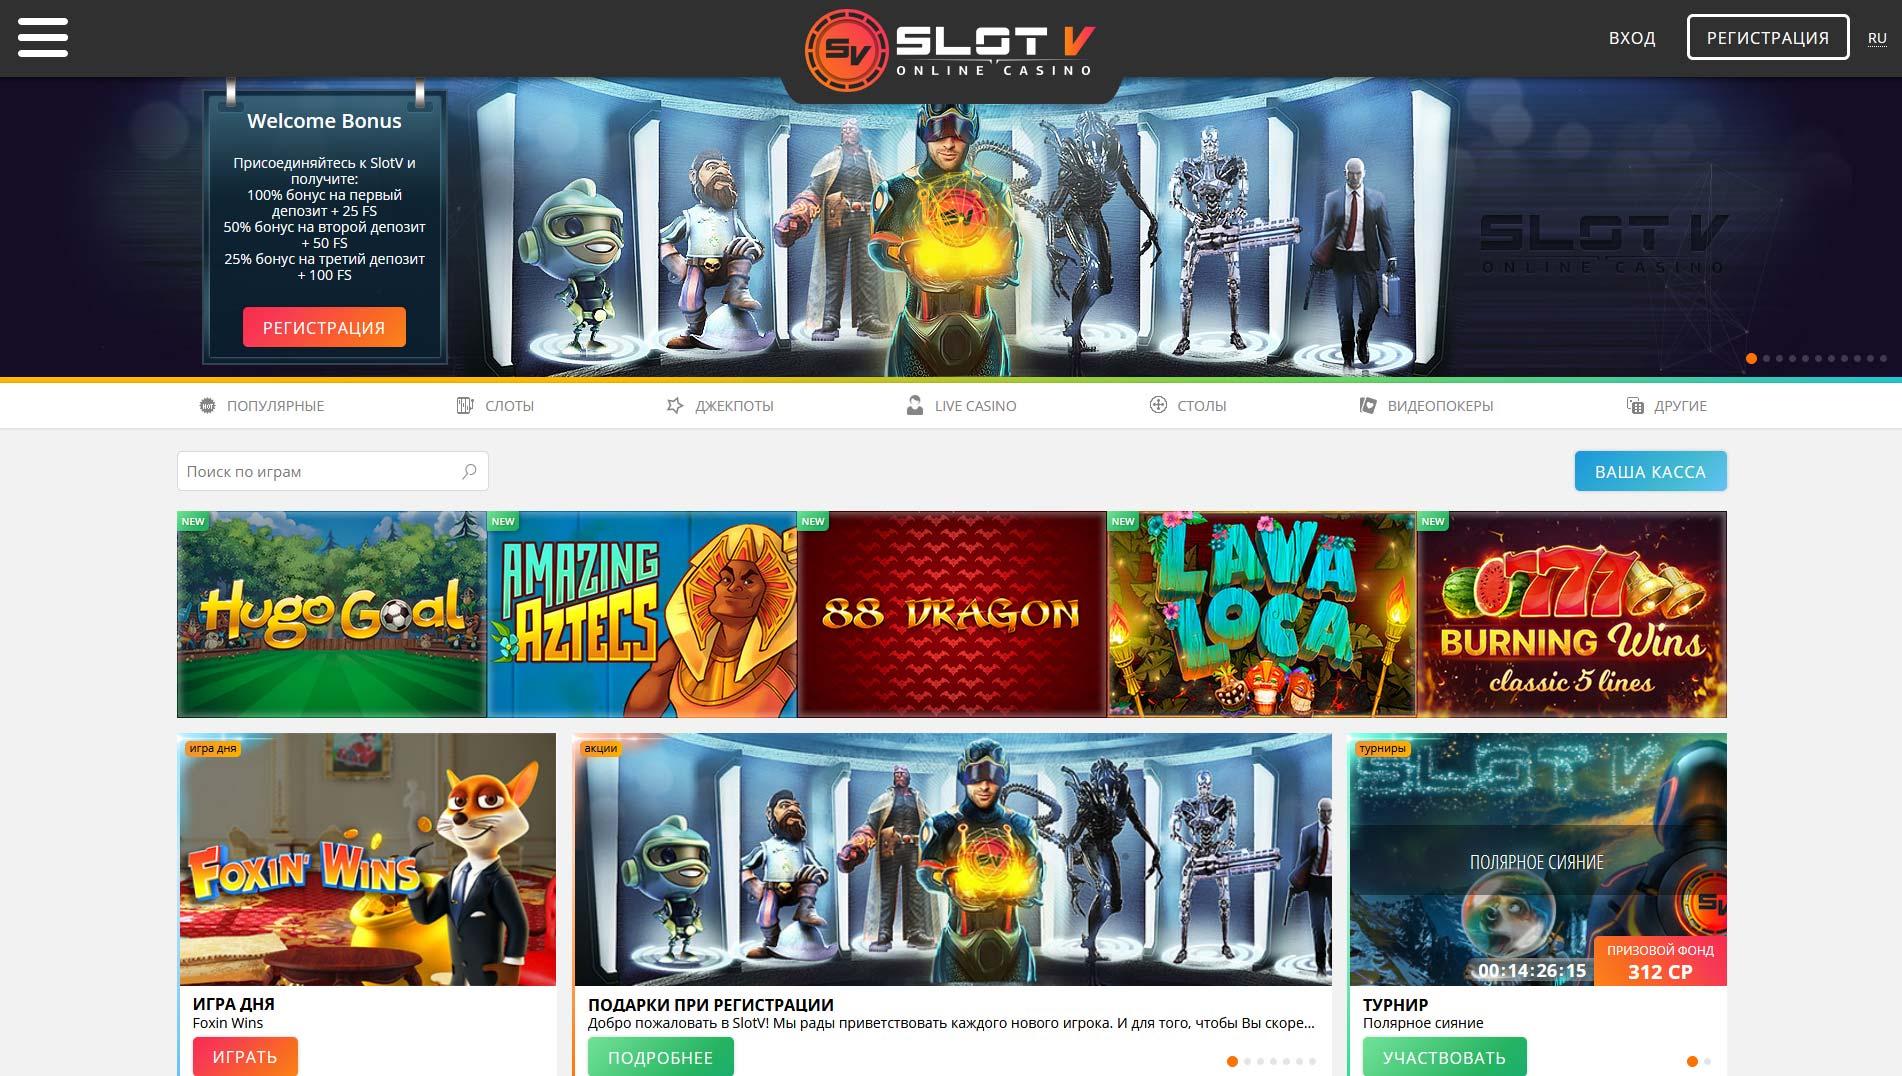 онлайн казино slot v отзывы